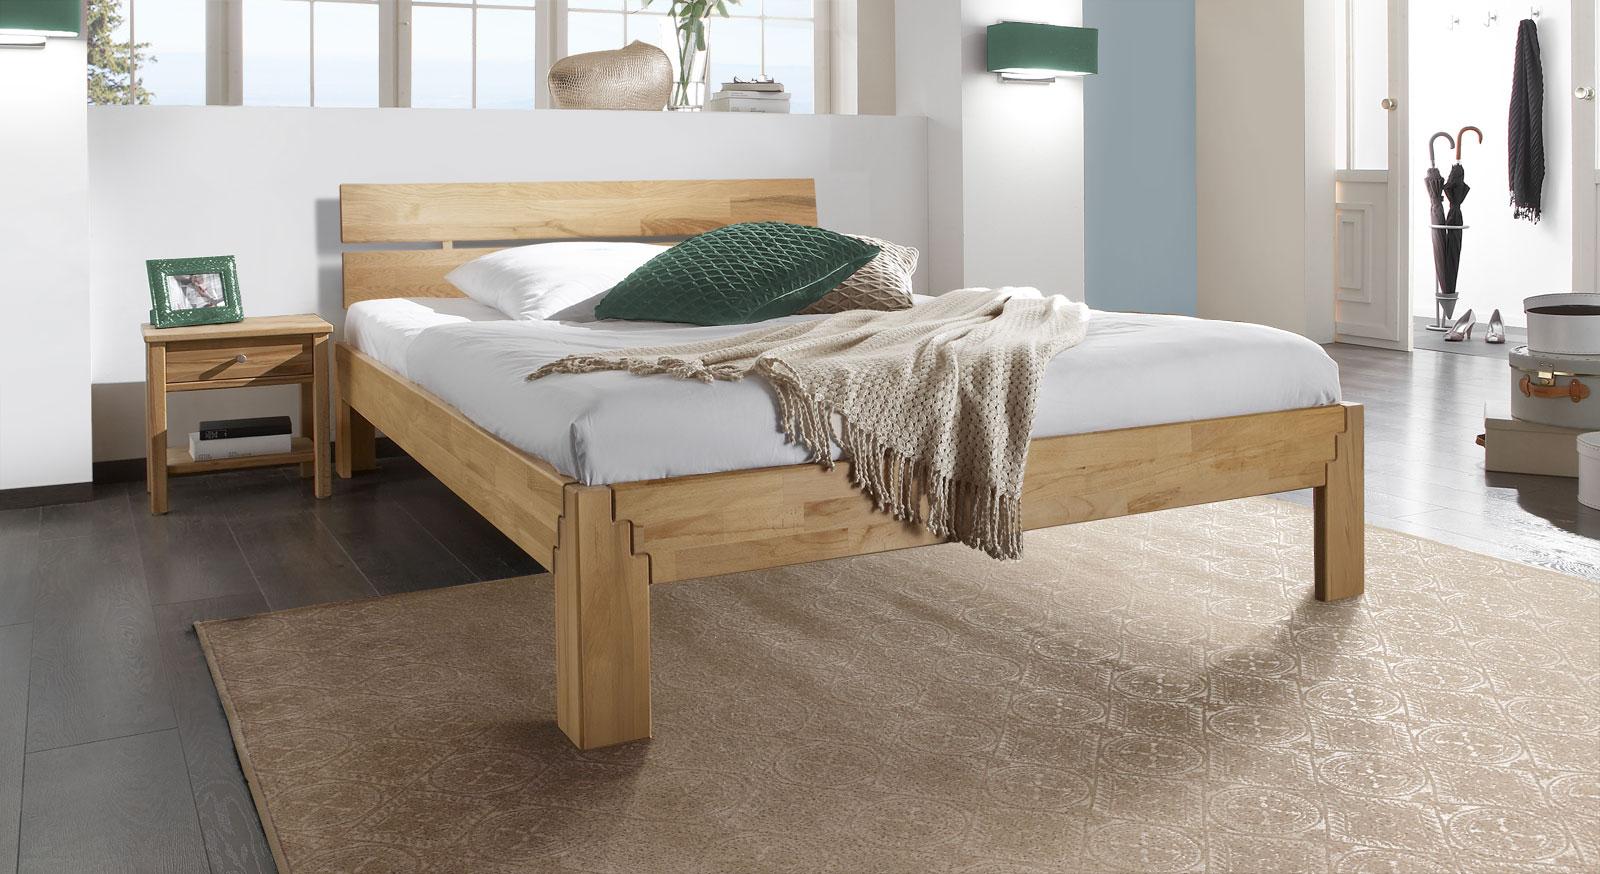 schlafzimmer set 160x200 d nisches bettenlager bettdecken bergr e schlaf gut bettw sche c a. Black Bedroom Furniture Sets. Home Design Ideas